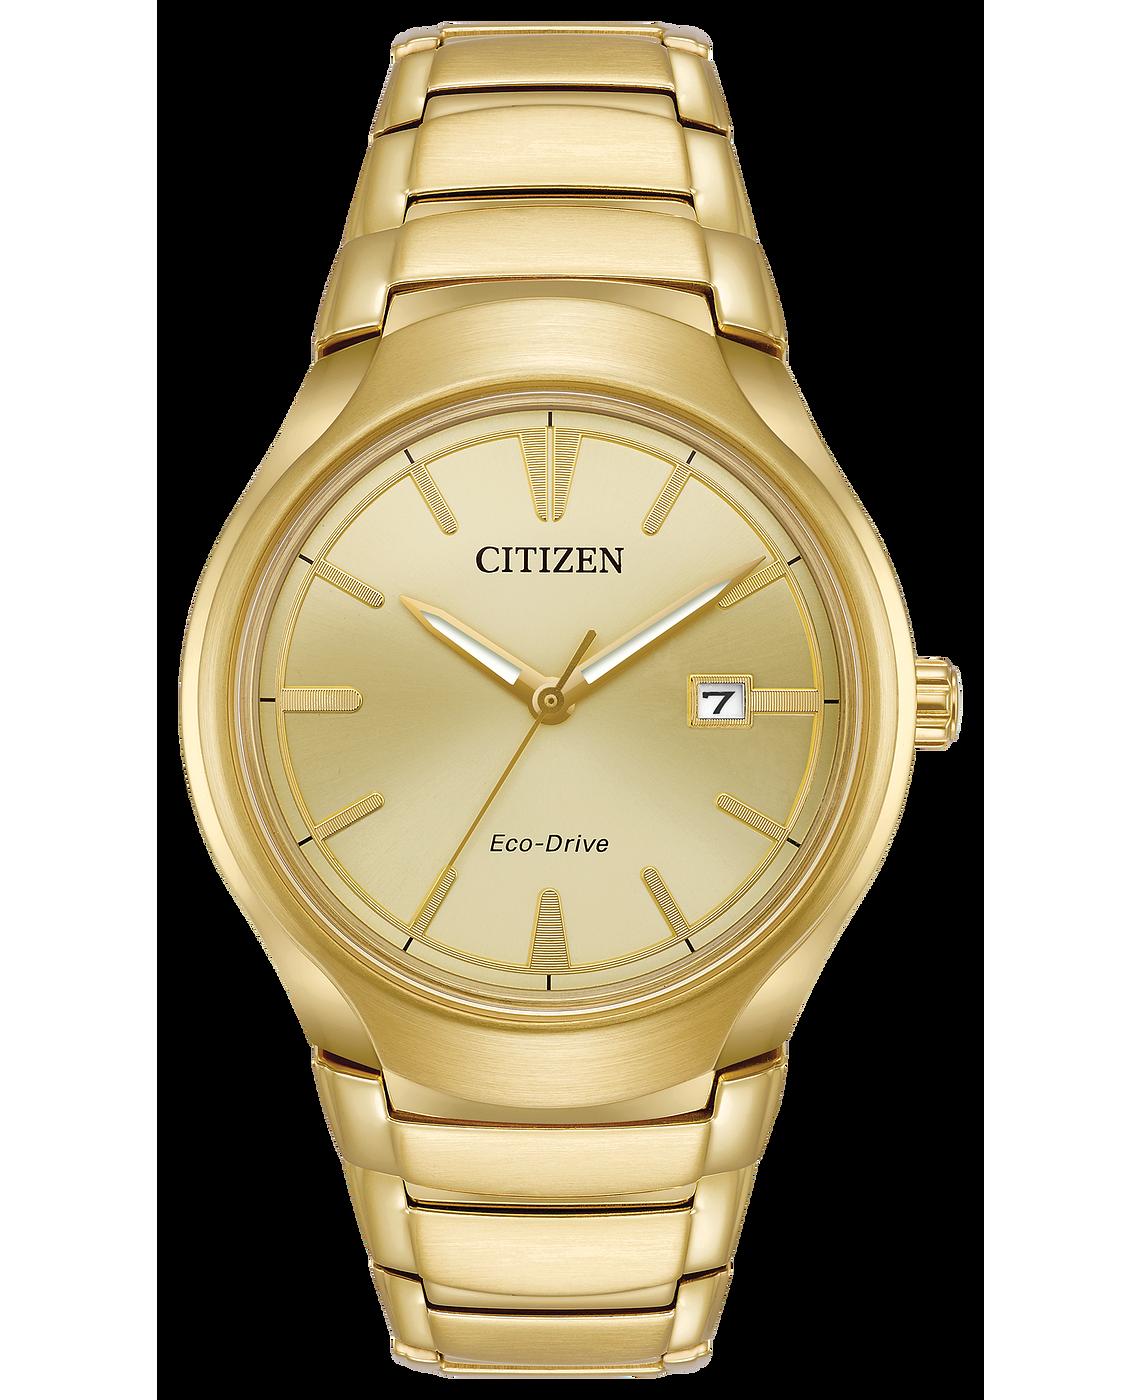 Pardigm - Men's Eco-Drive Gold Tone Champagne Dial Date Watch | Citizen